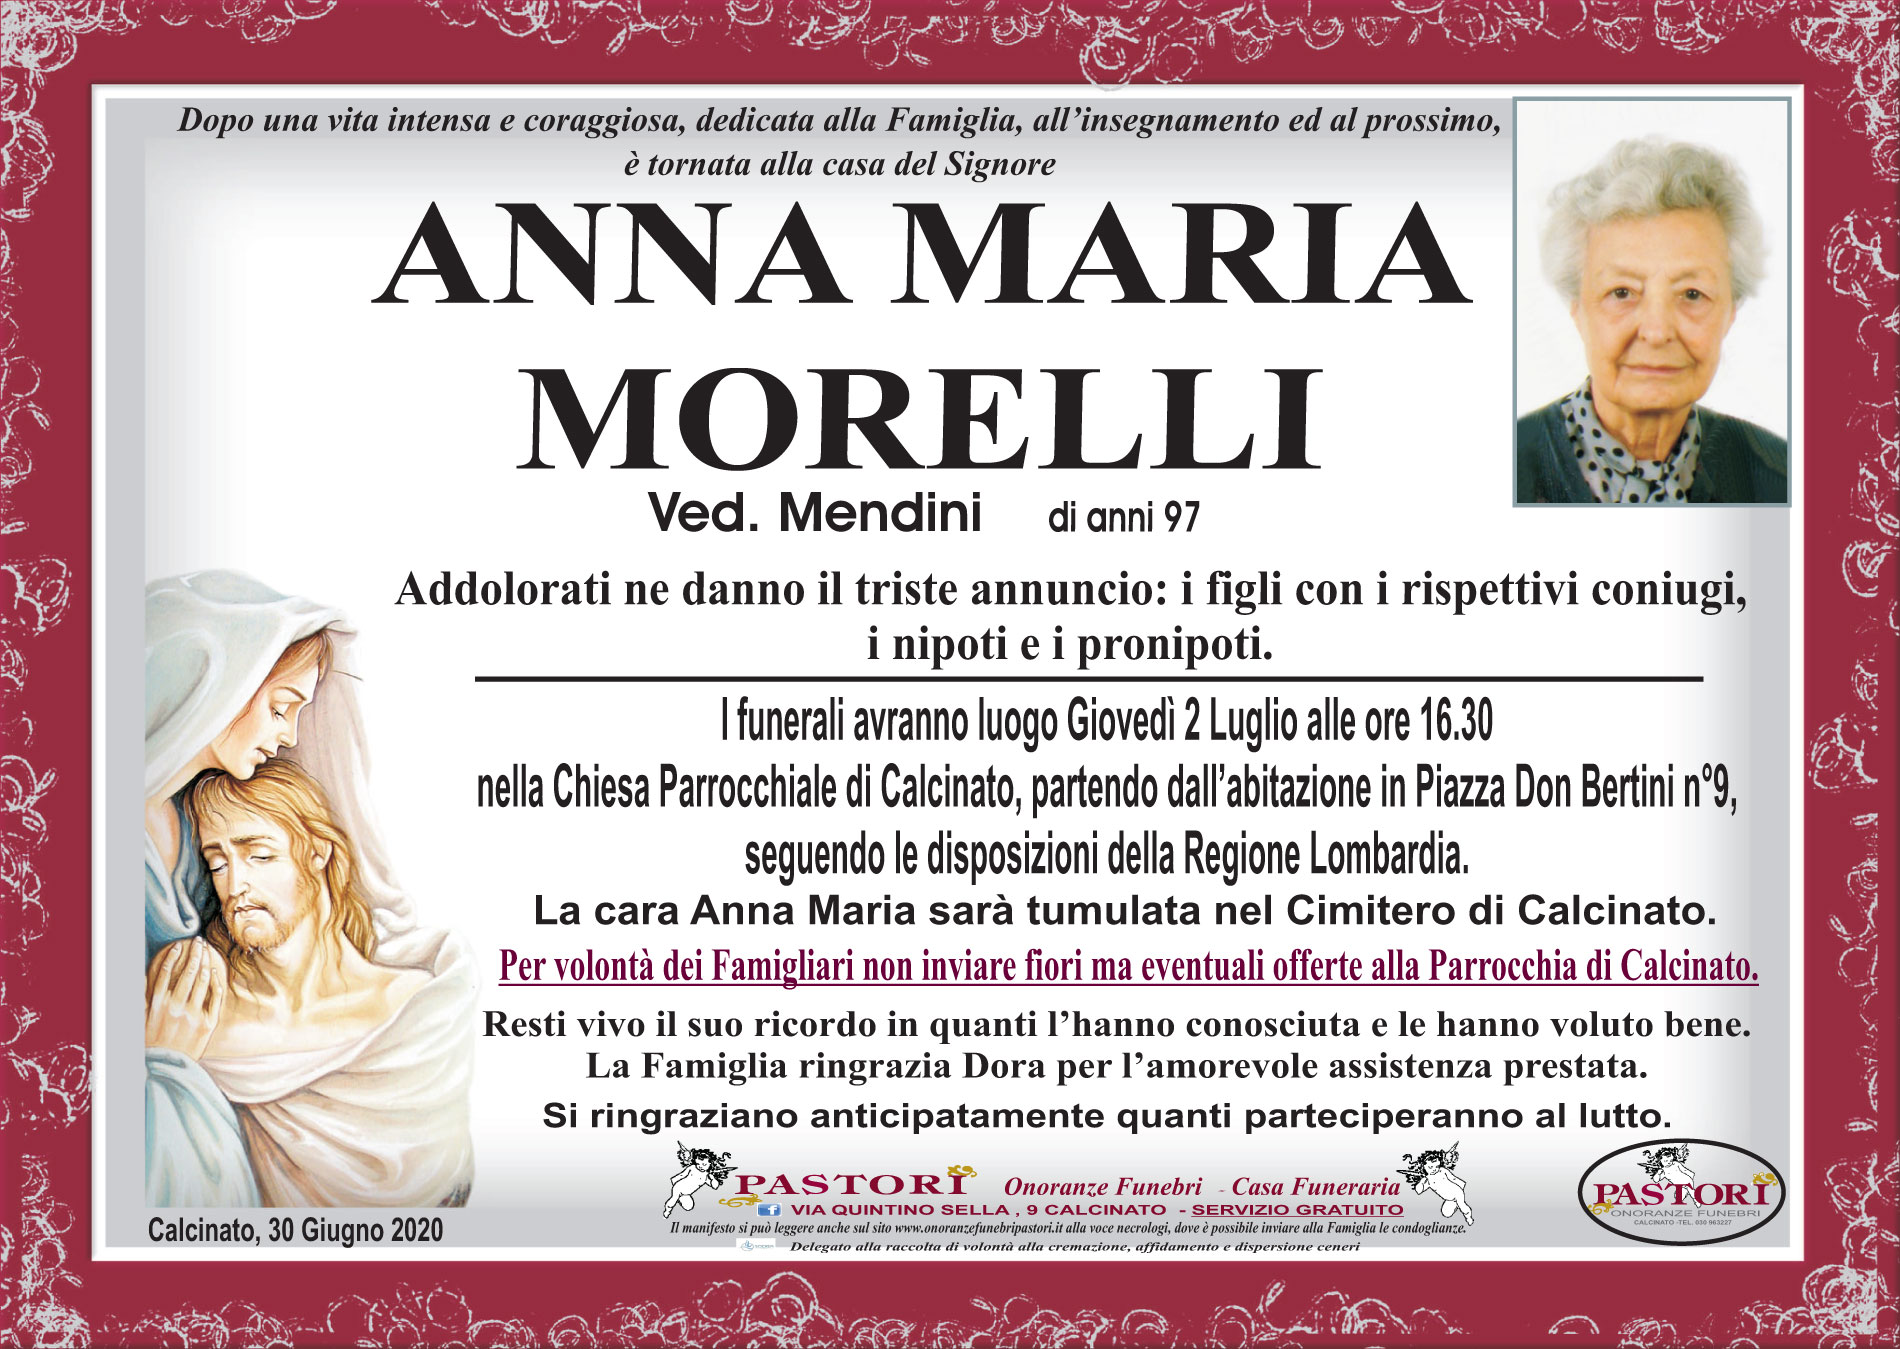 Anna Maria Morelli